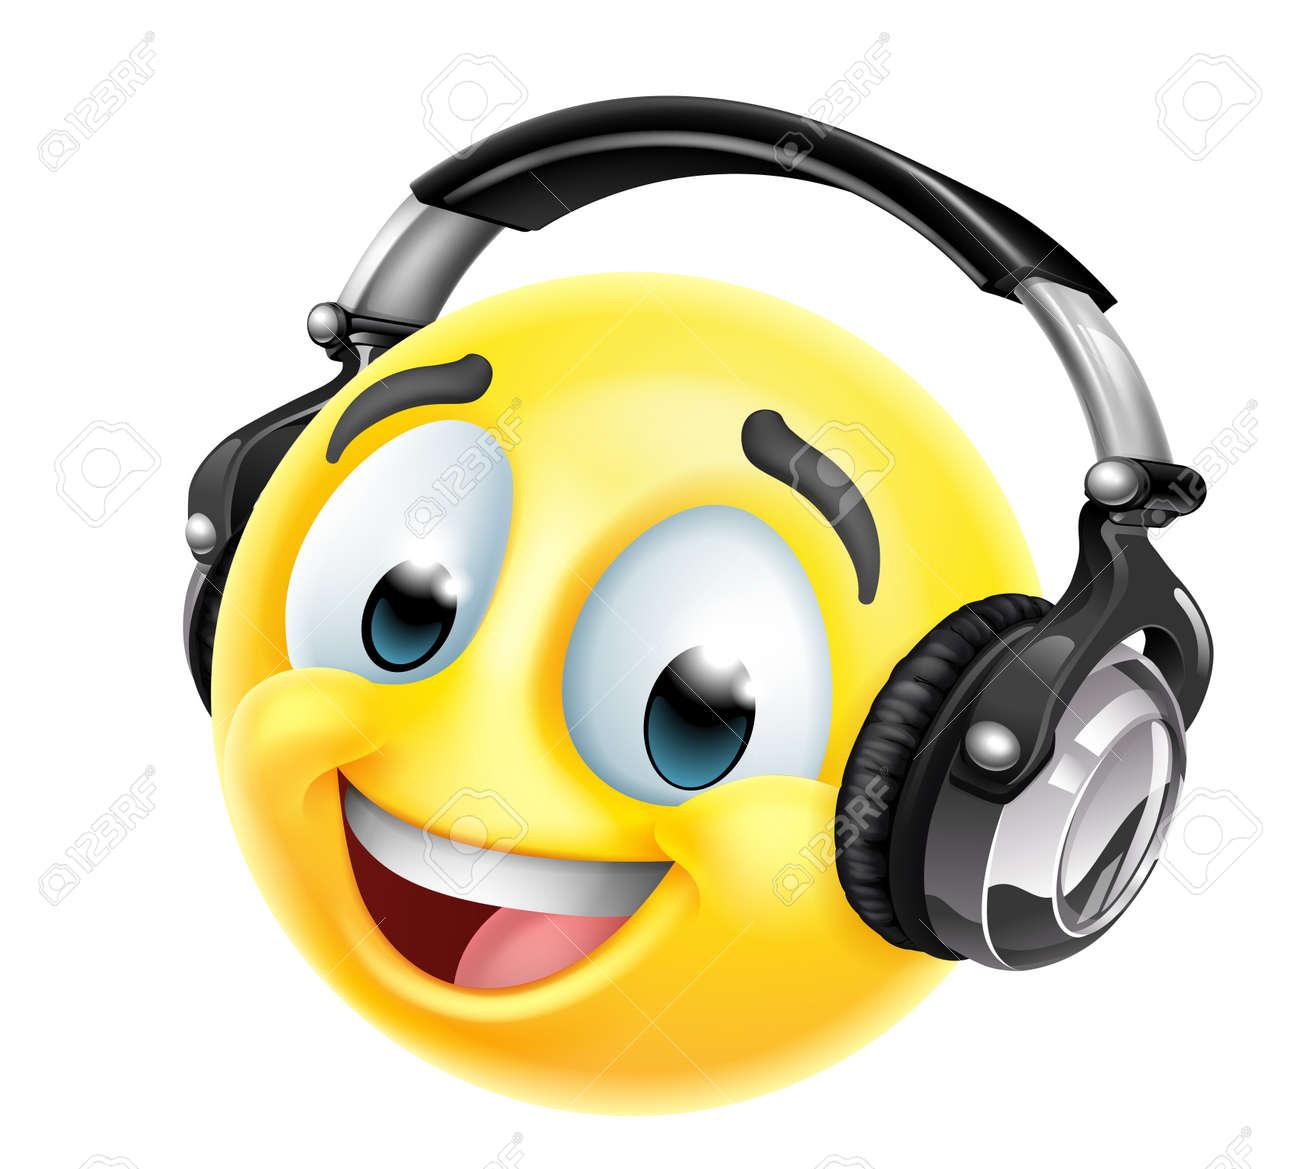 Cartoon Emoticon Face Icon With Music Headphones - 168332647